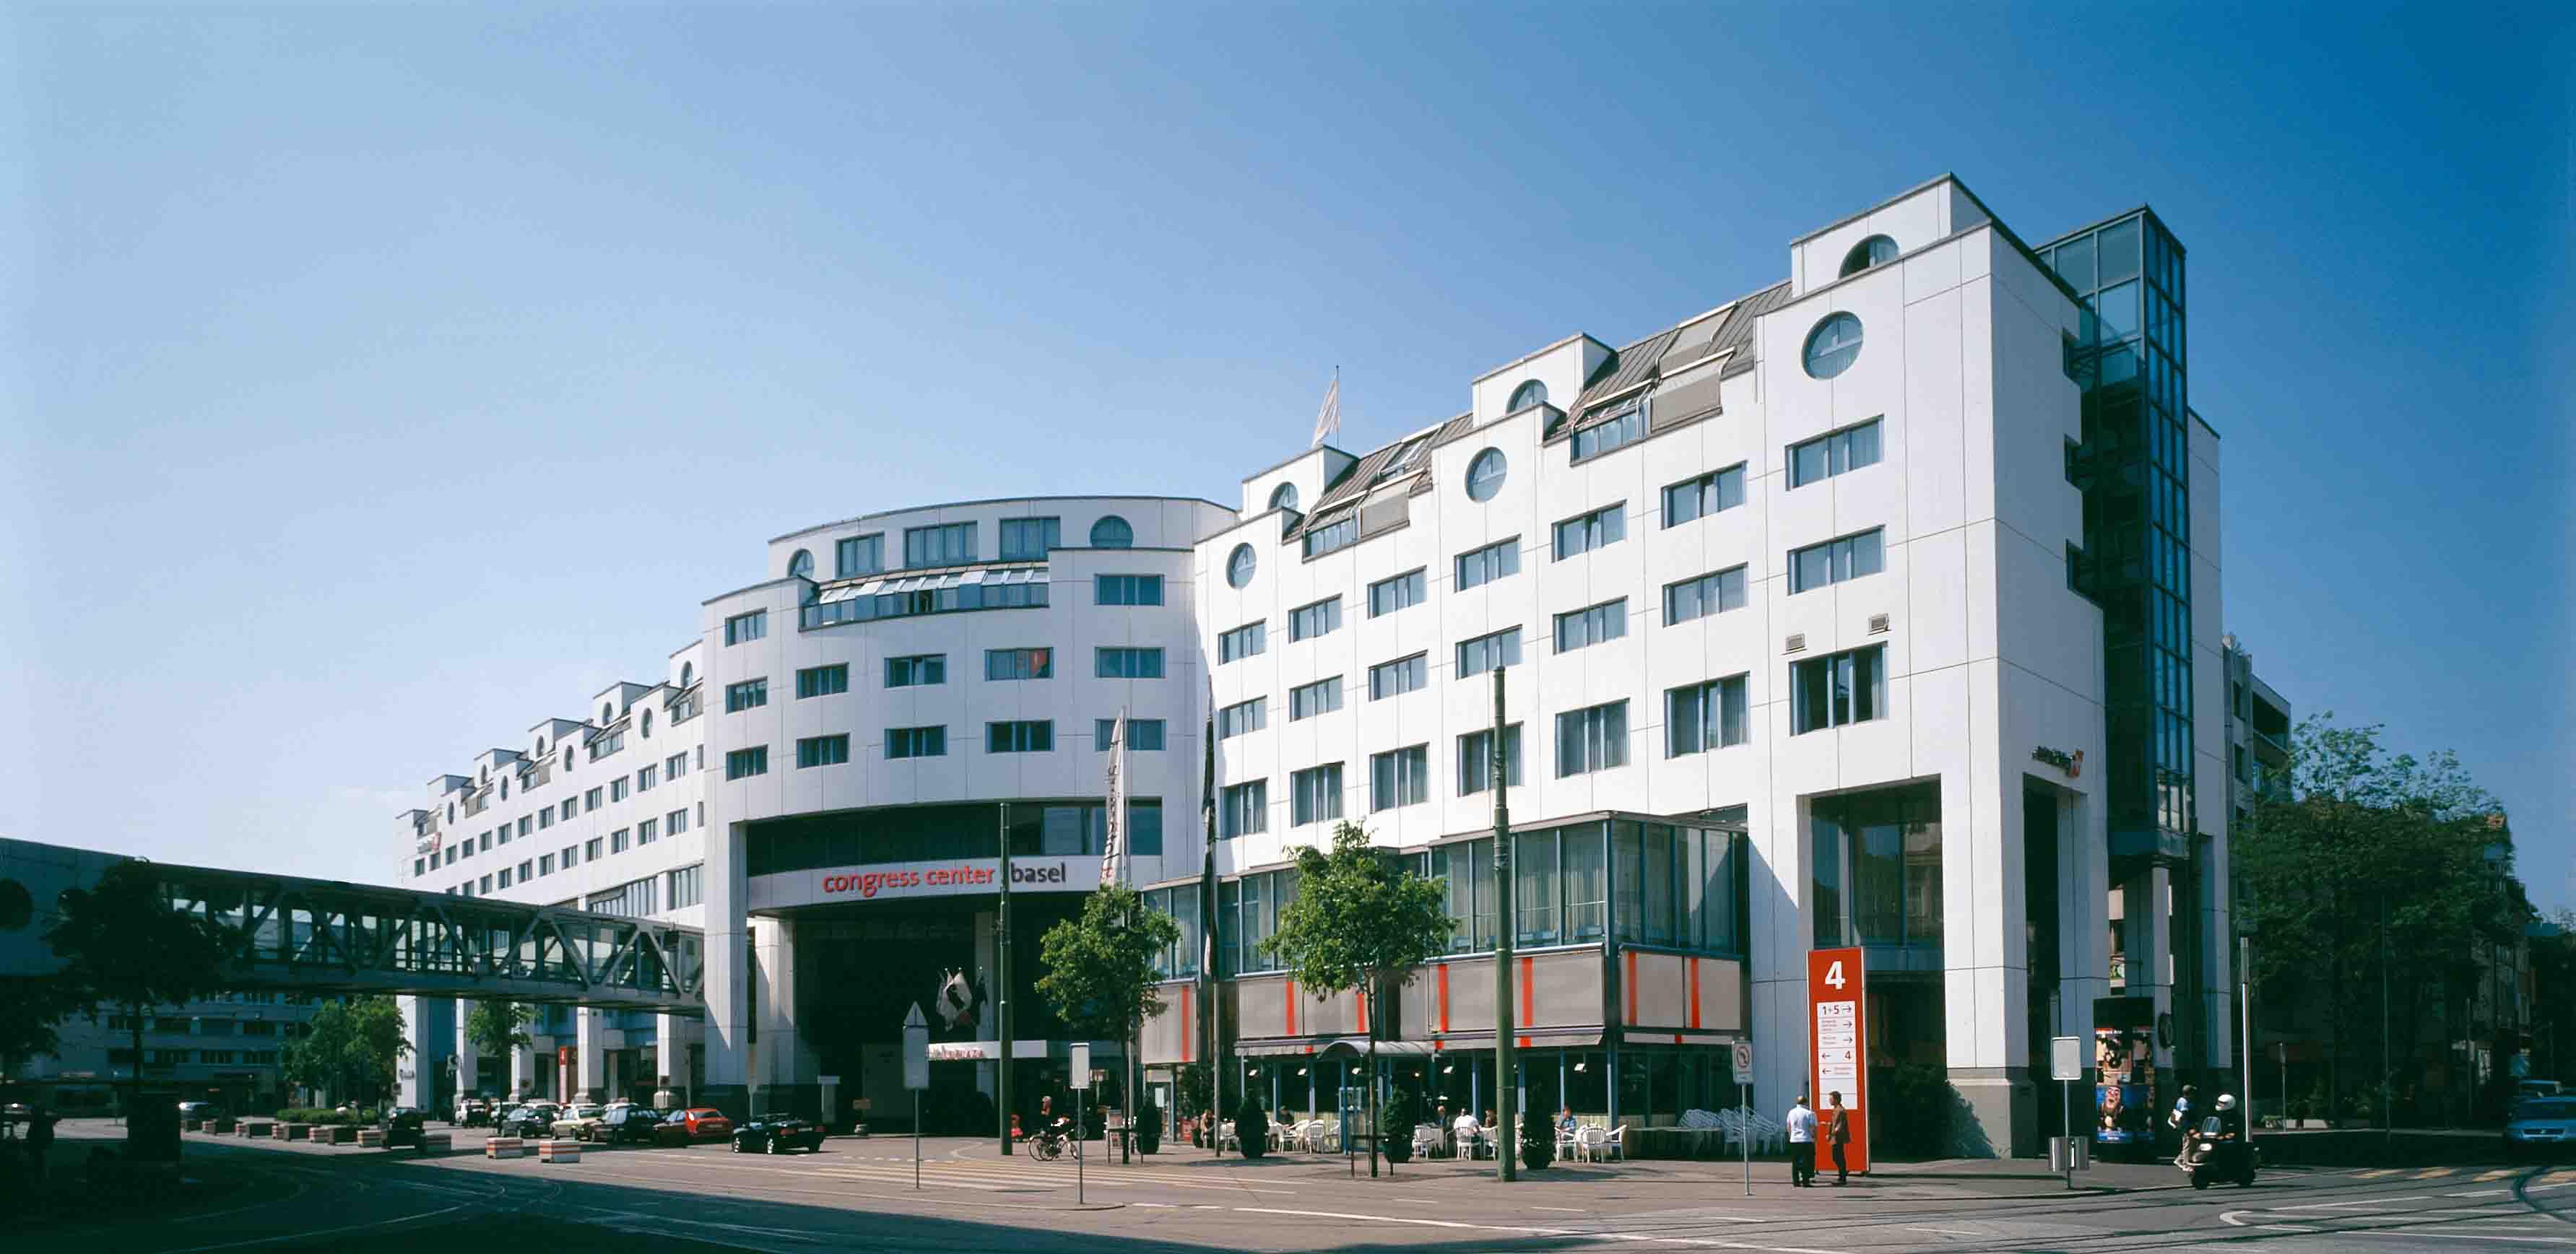 Swissôtel Le Plaza in Basel - Hotelsponsor